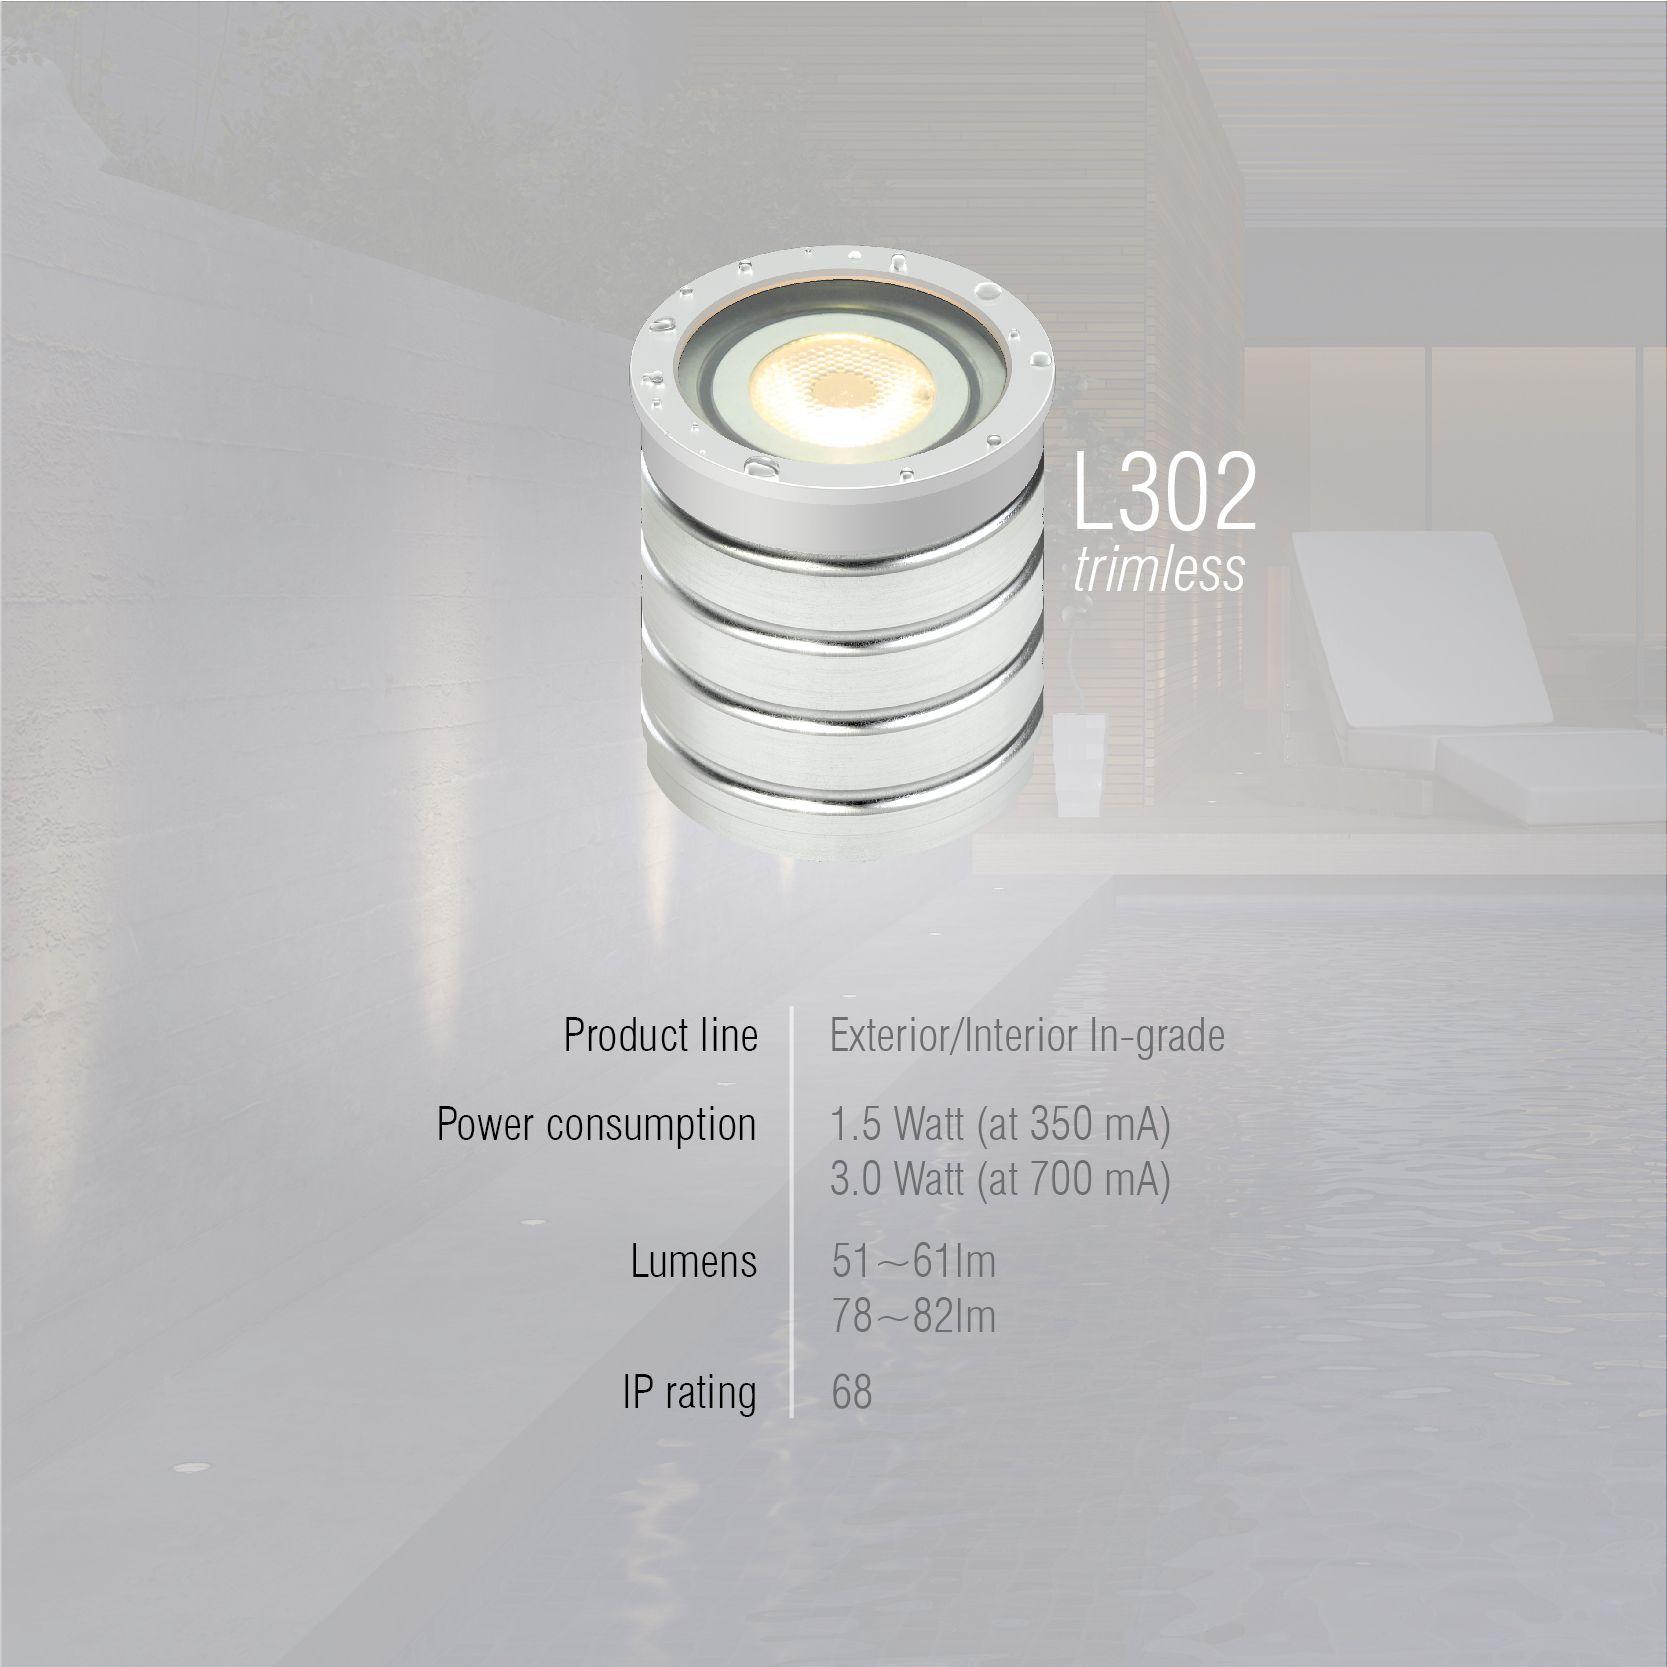 L302 Ll In Grade Luminaire Was Designed